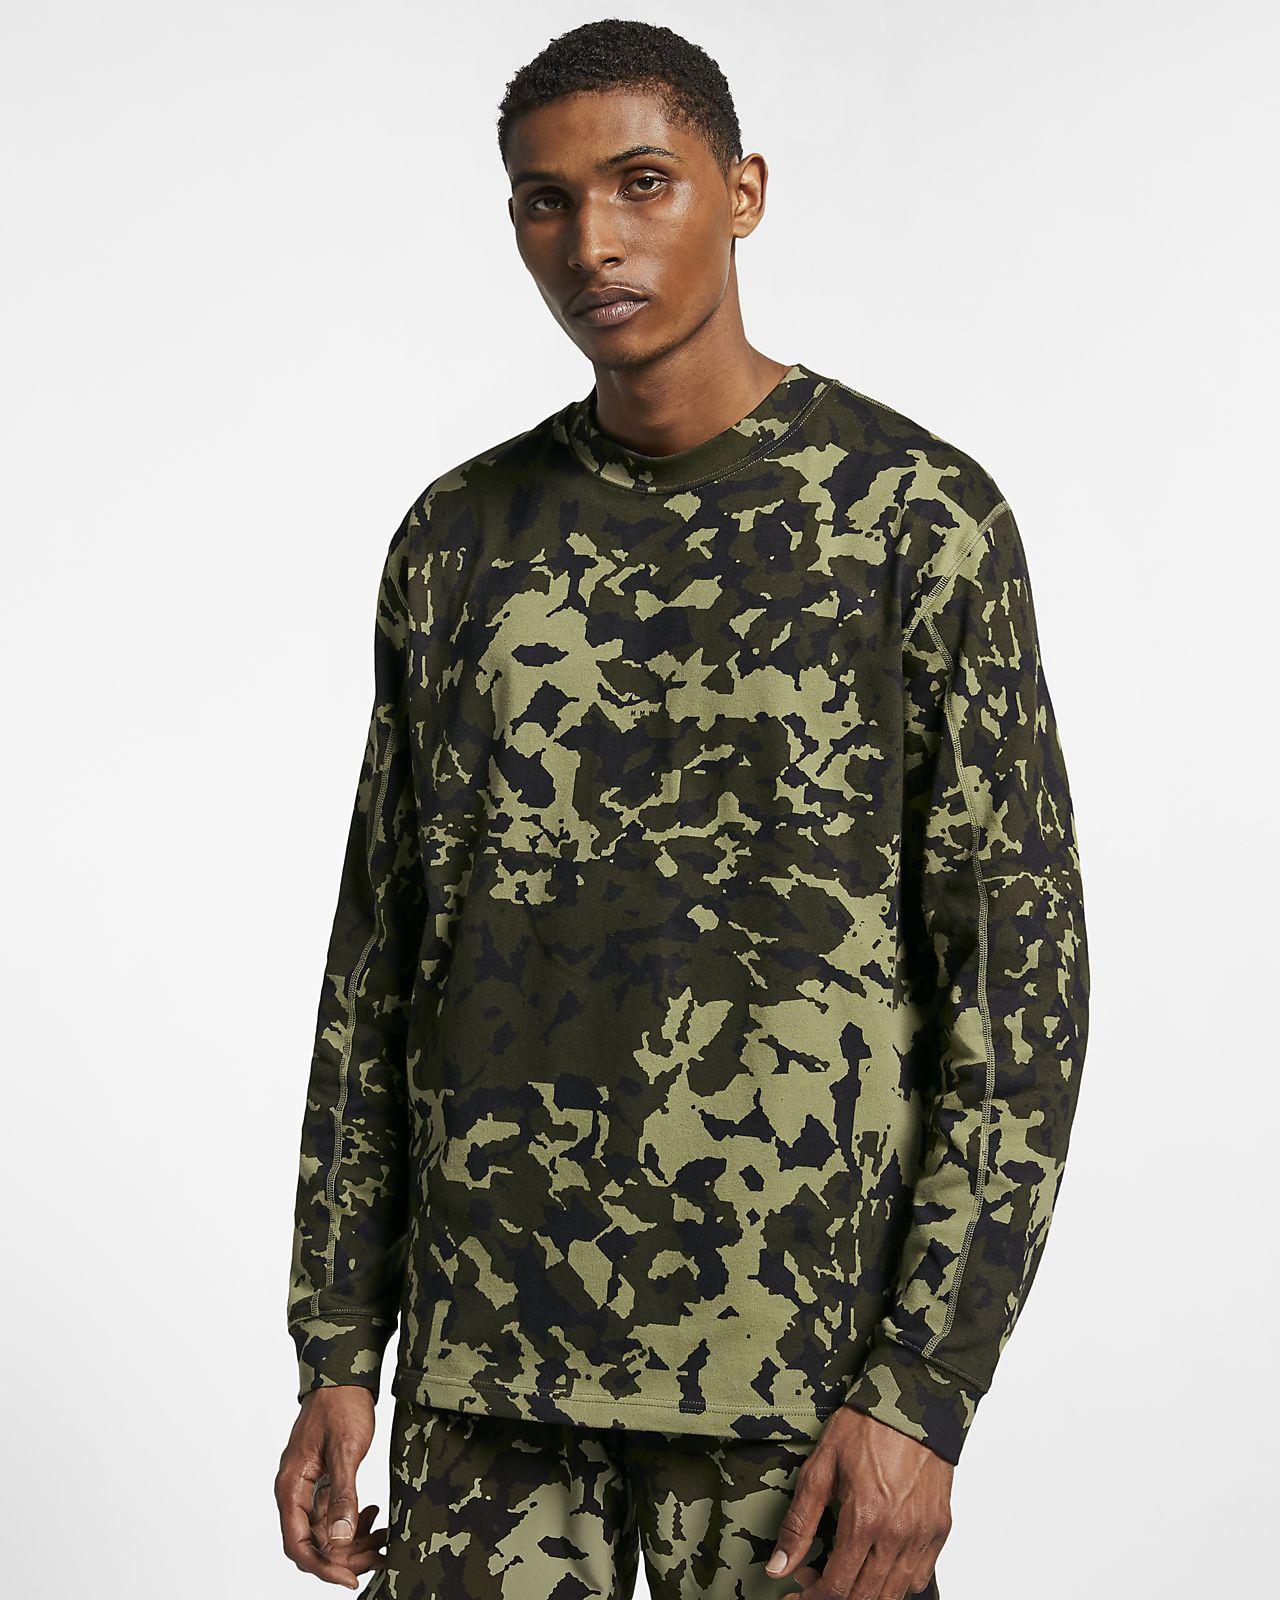 Nike x MMW Men's Printed Long-Sleeve Top